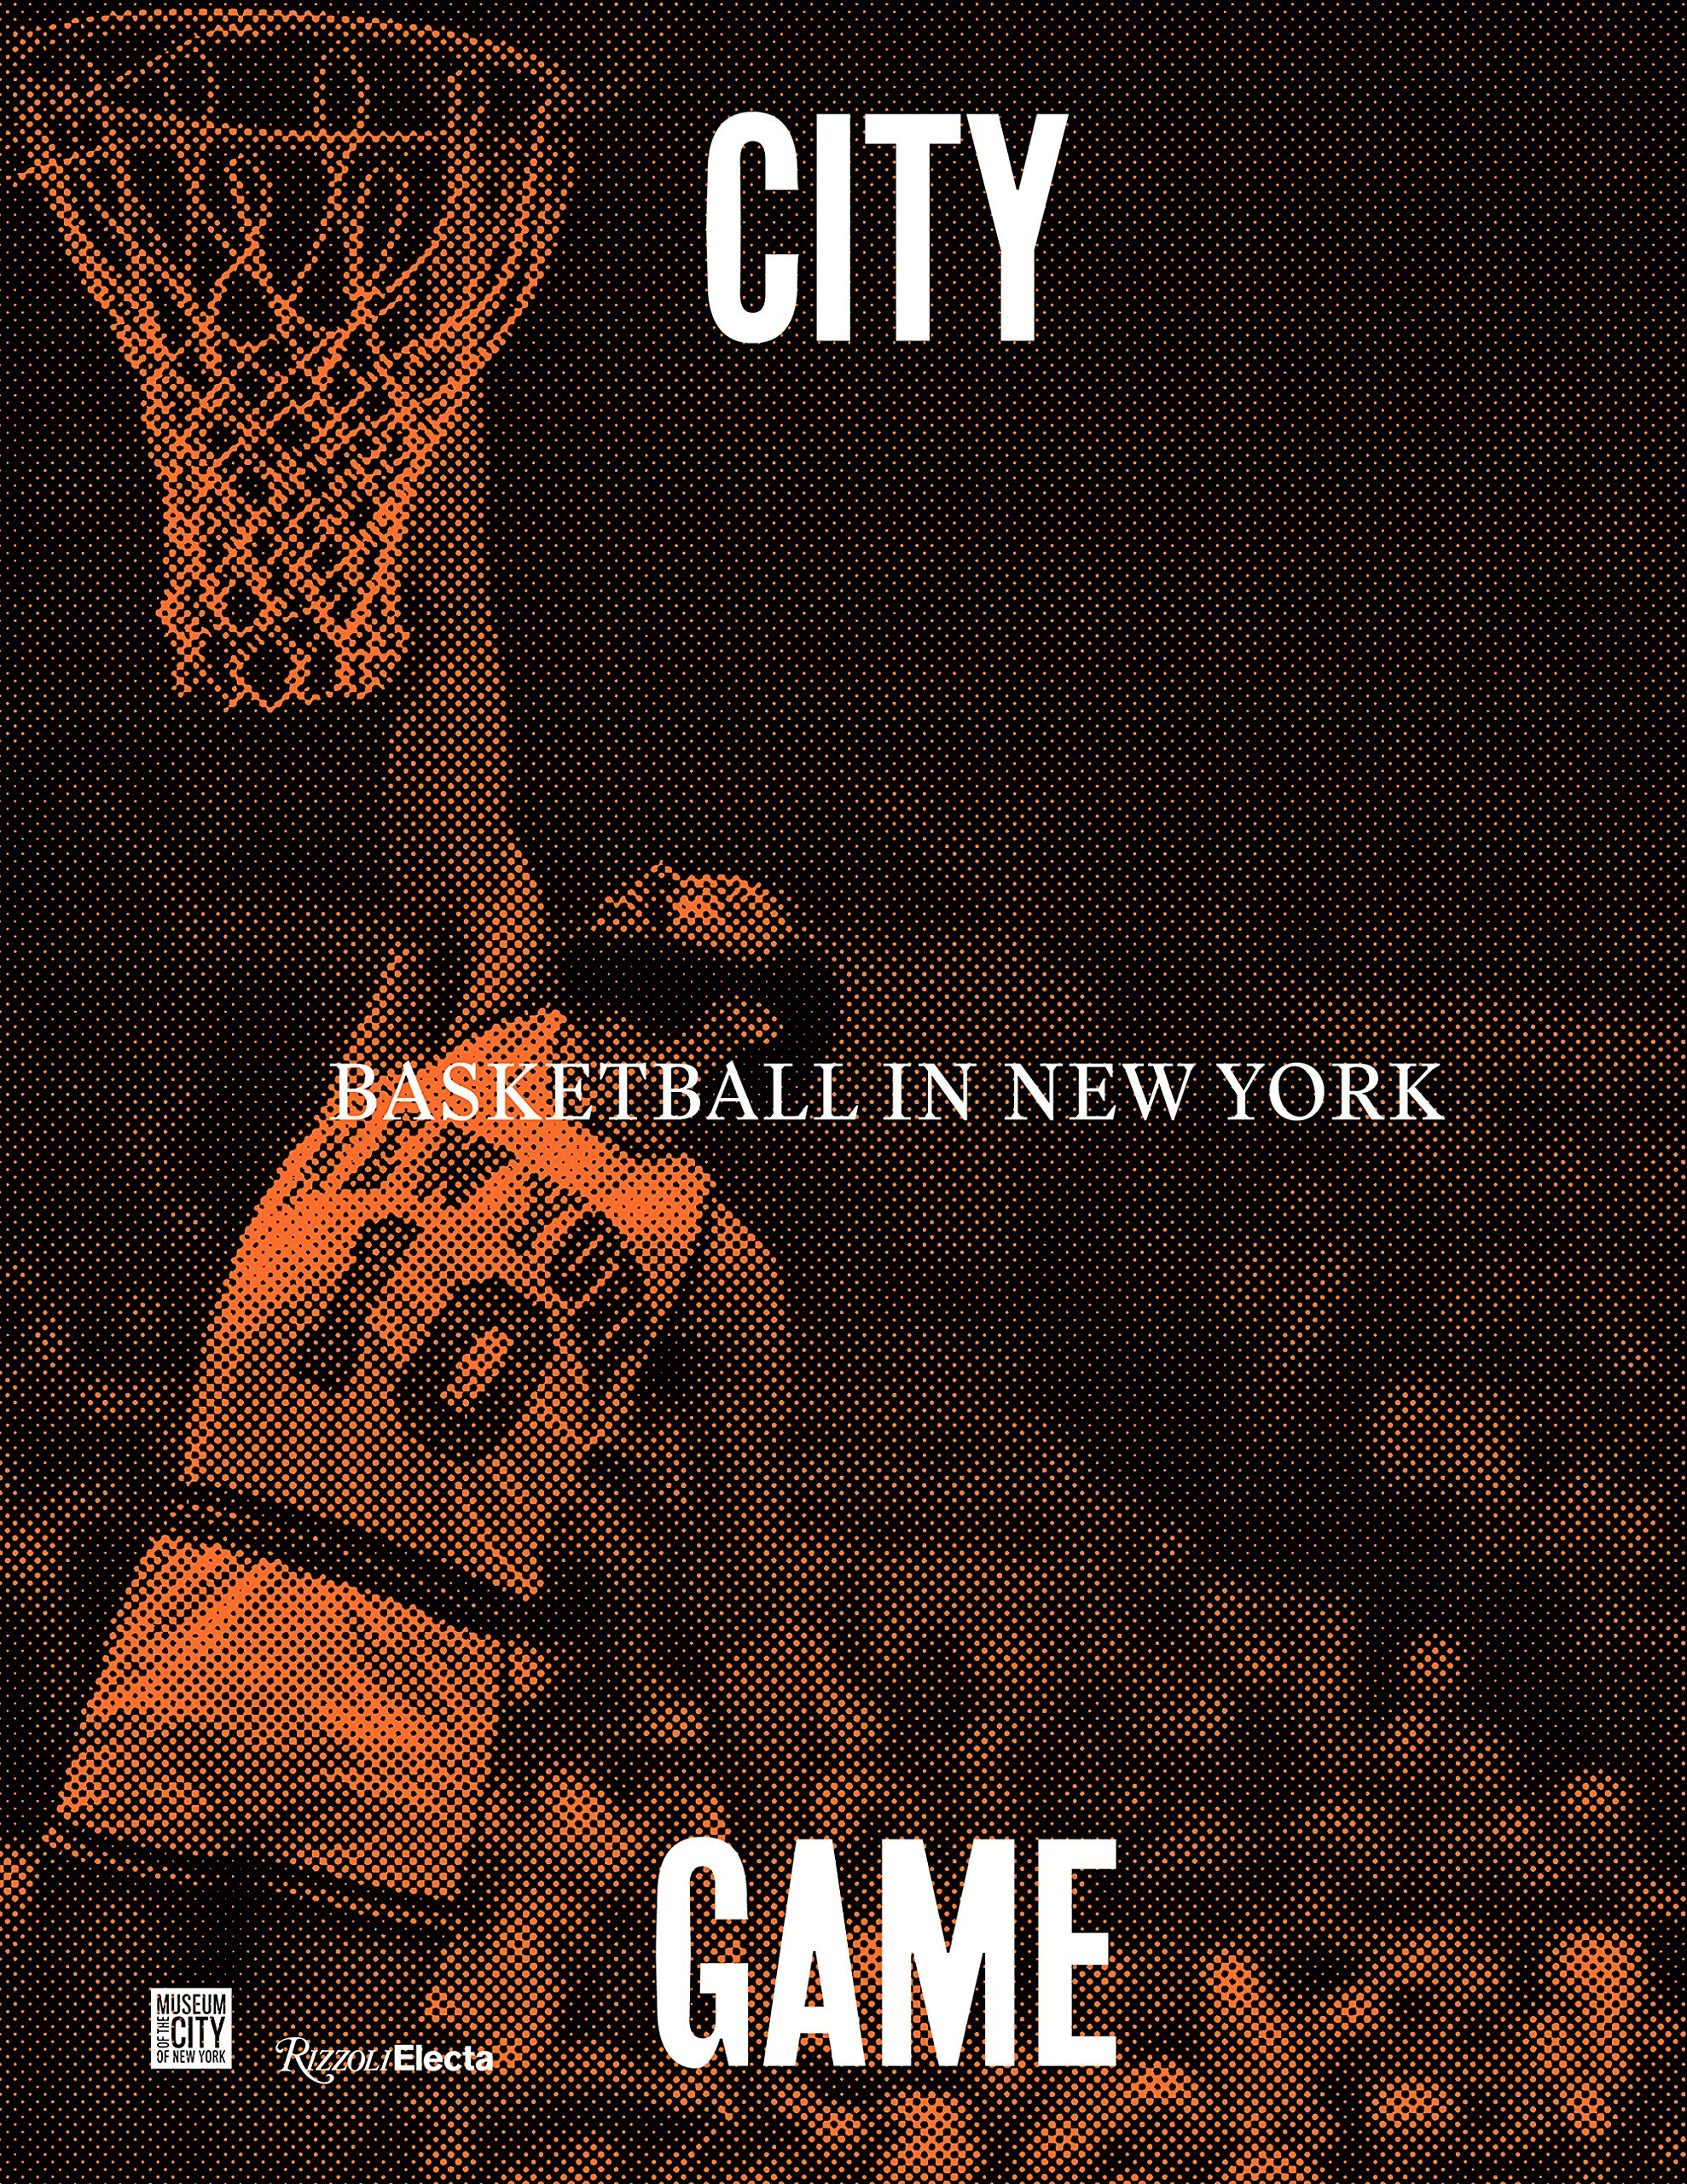 Amazon.com: City/Game: Basketball in New York (9780847867622 ...